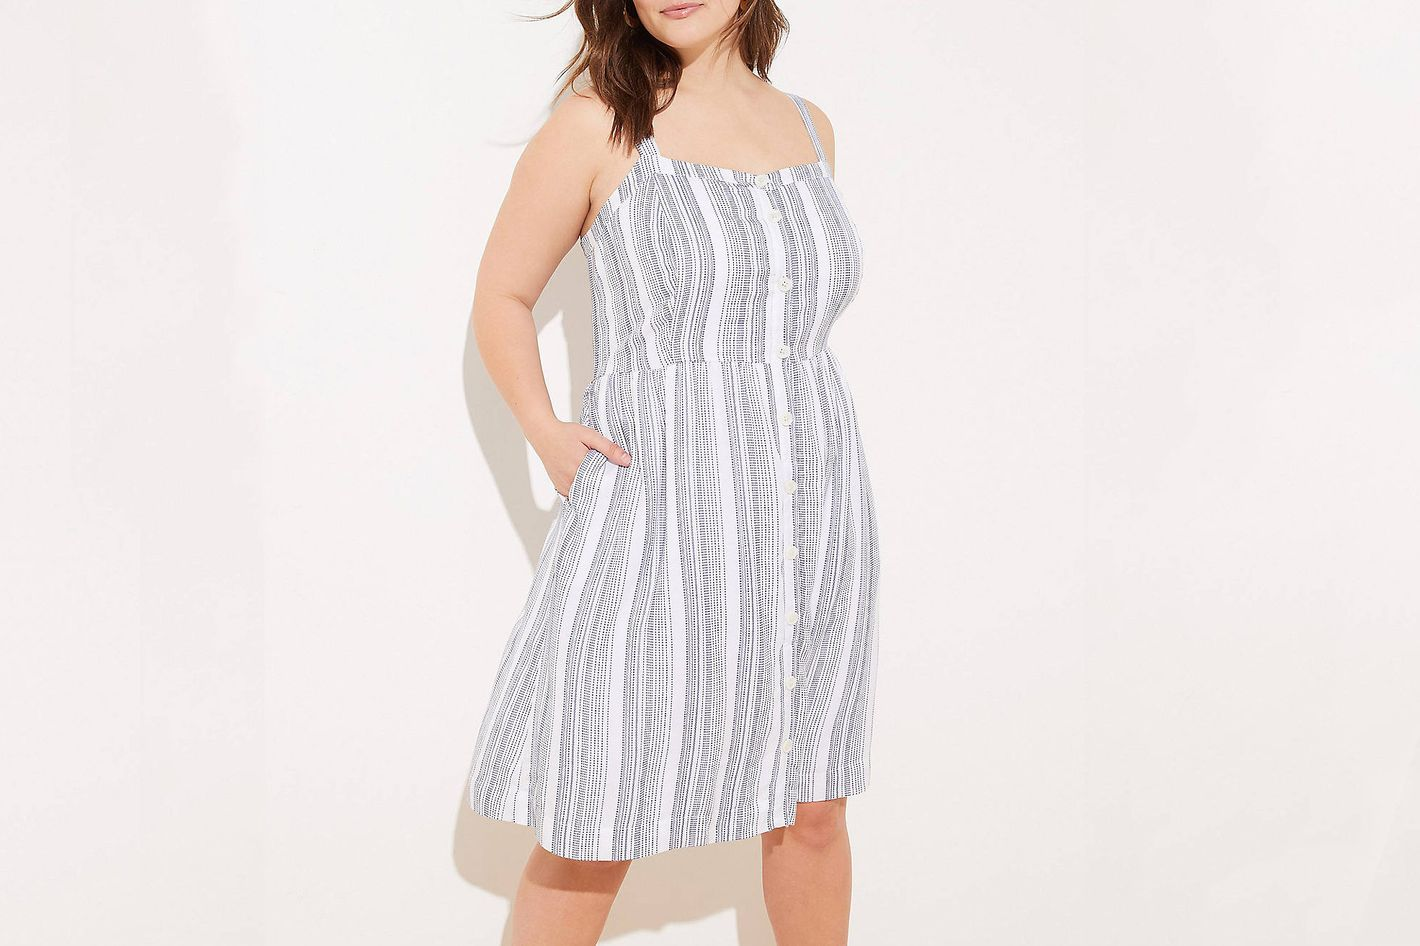 Loft Button Down Pocket Flare Dress in Blue Stripes